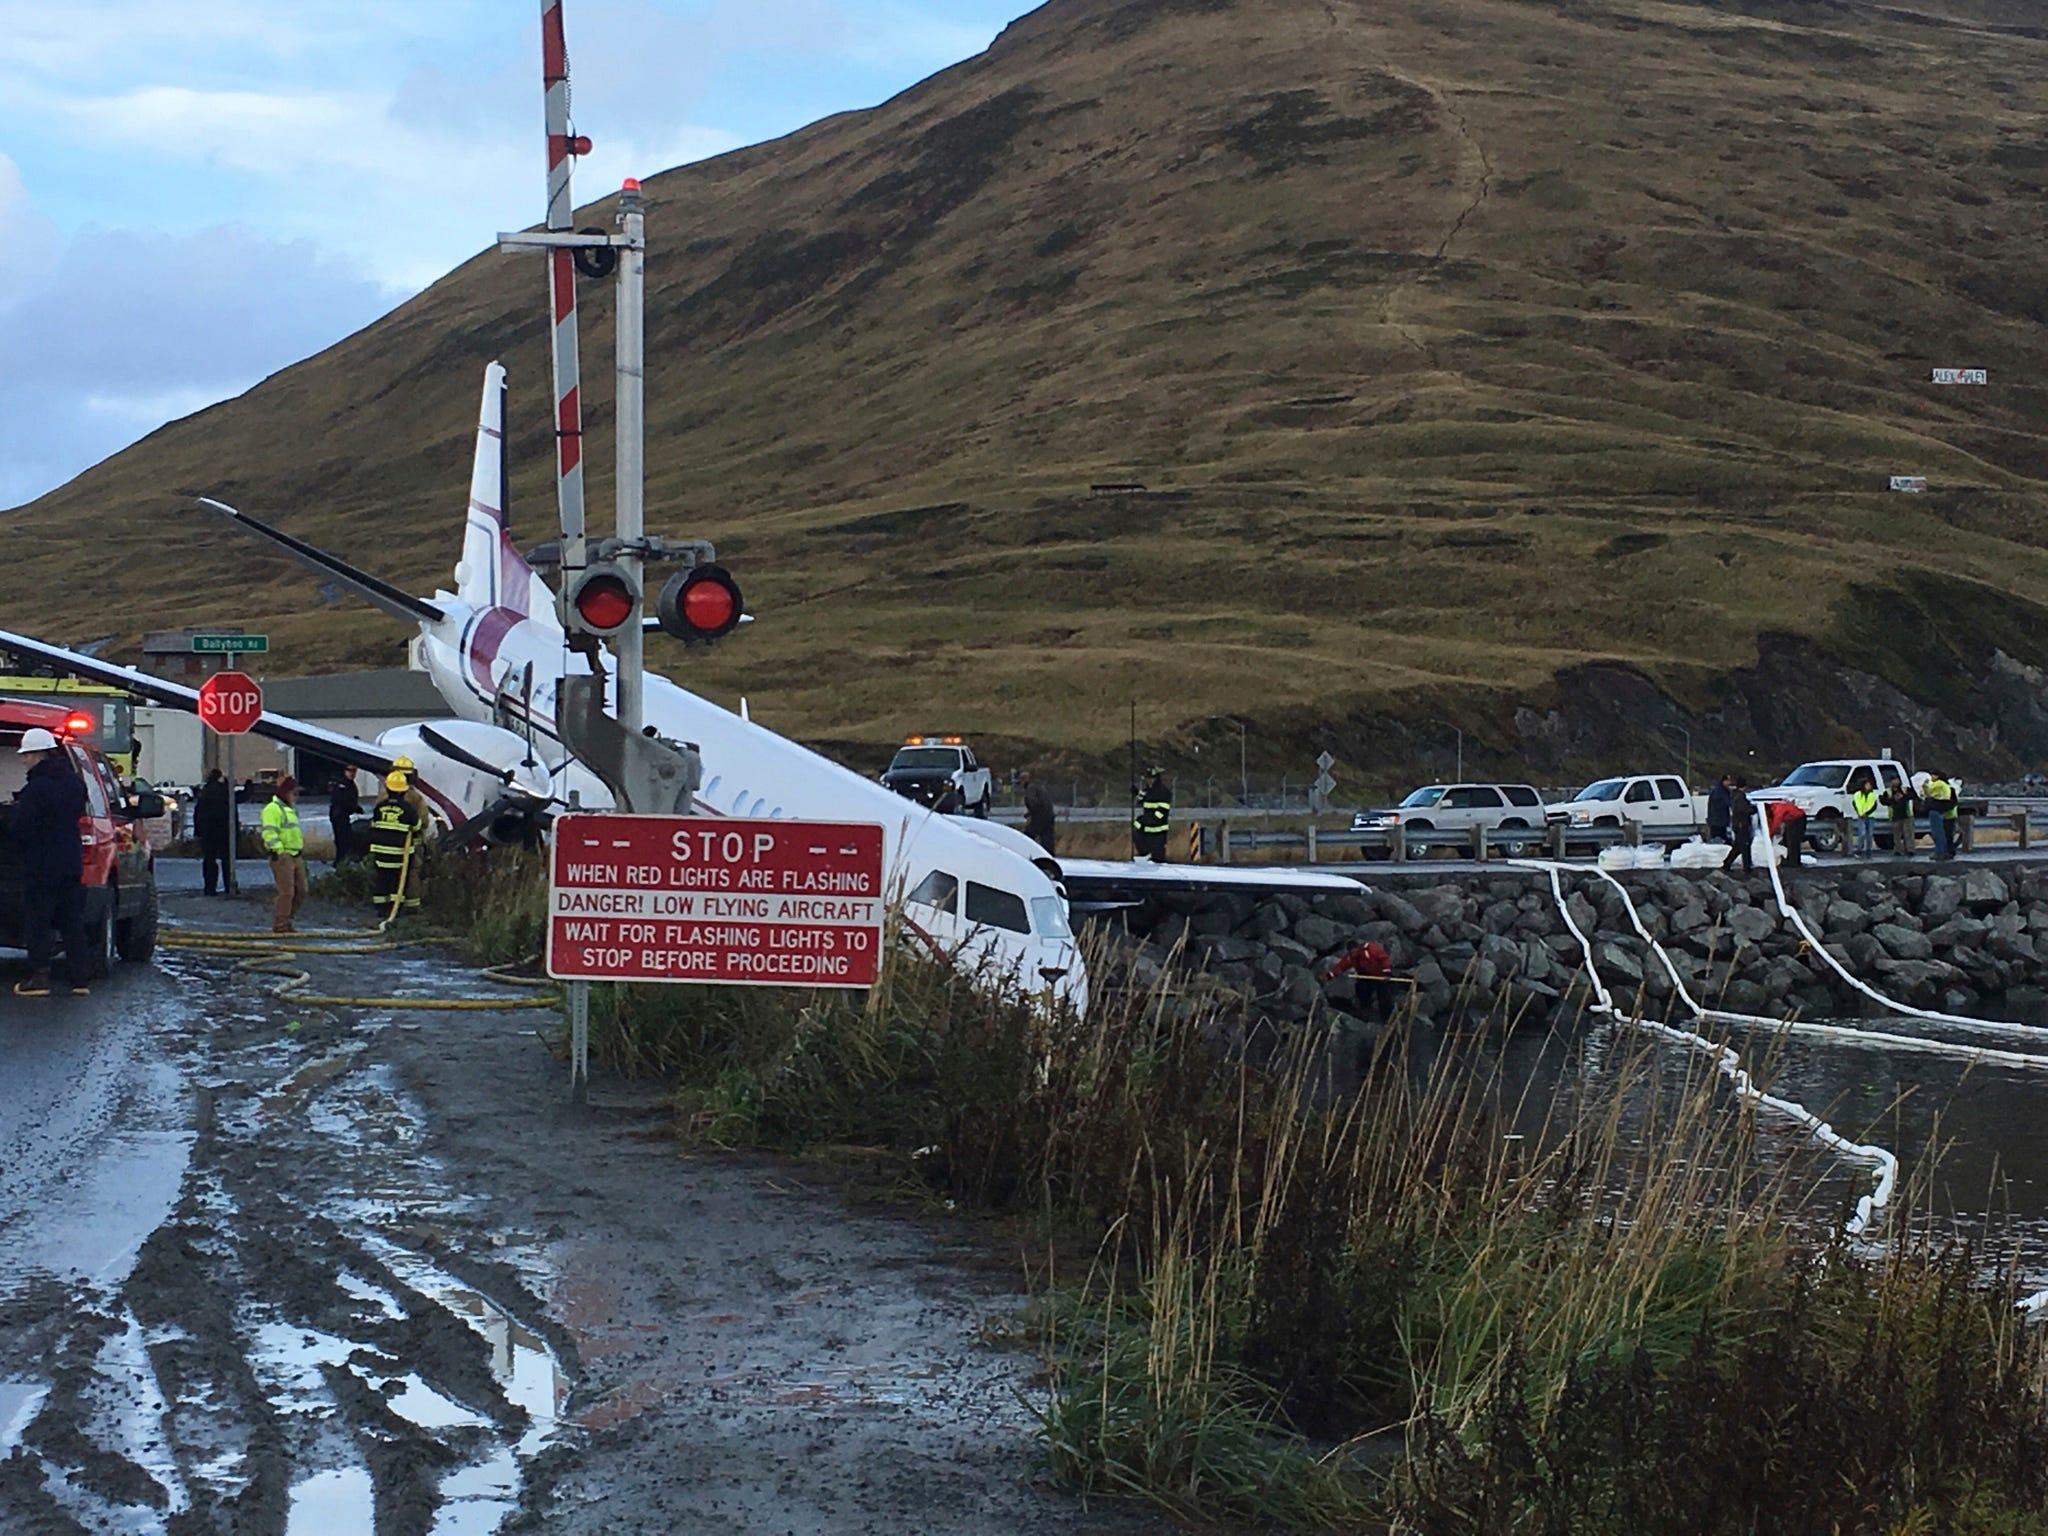 Alaska Plane Crash One Dead After Penair Plane Lands Off Runway